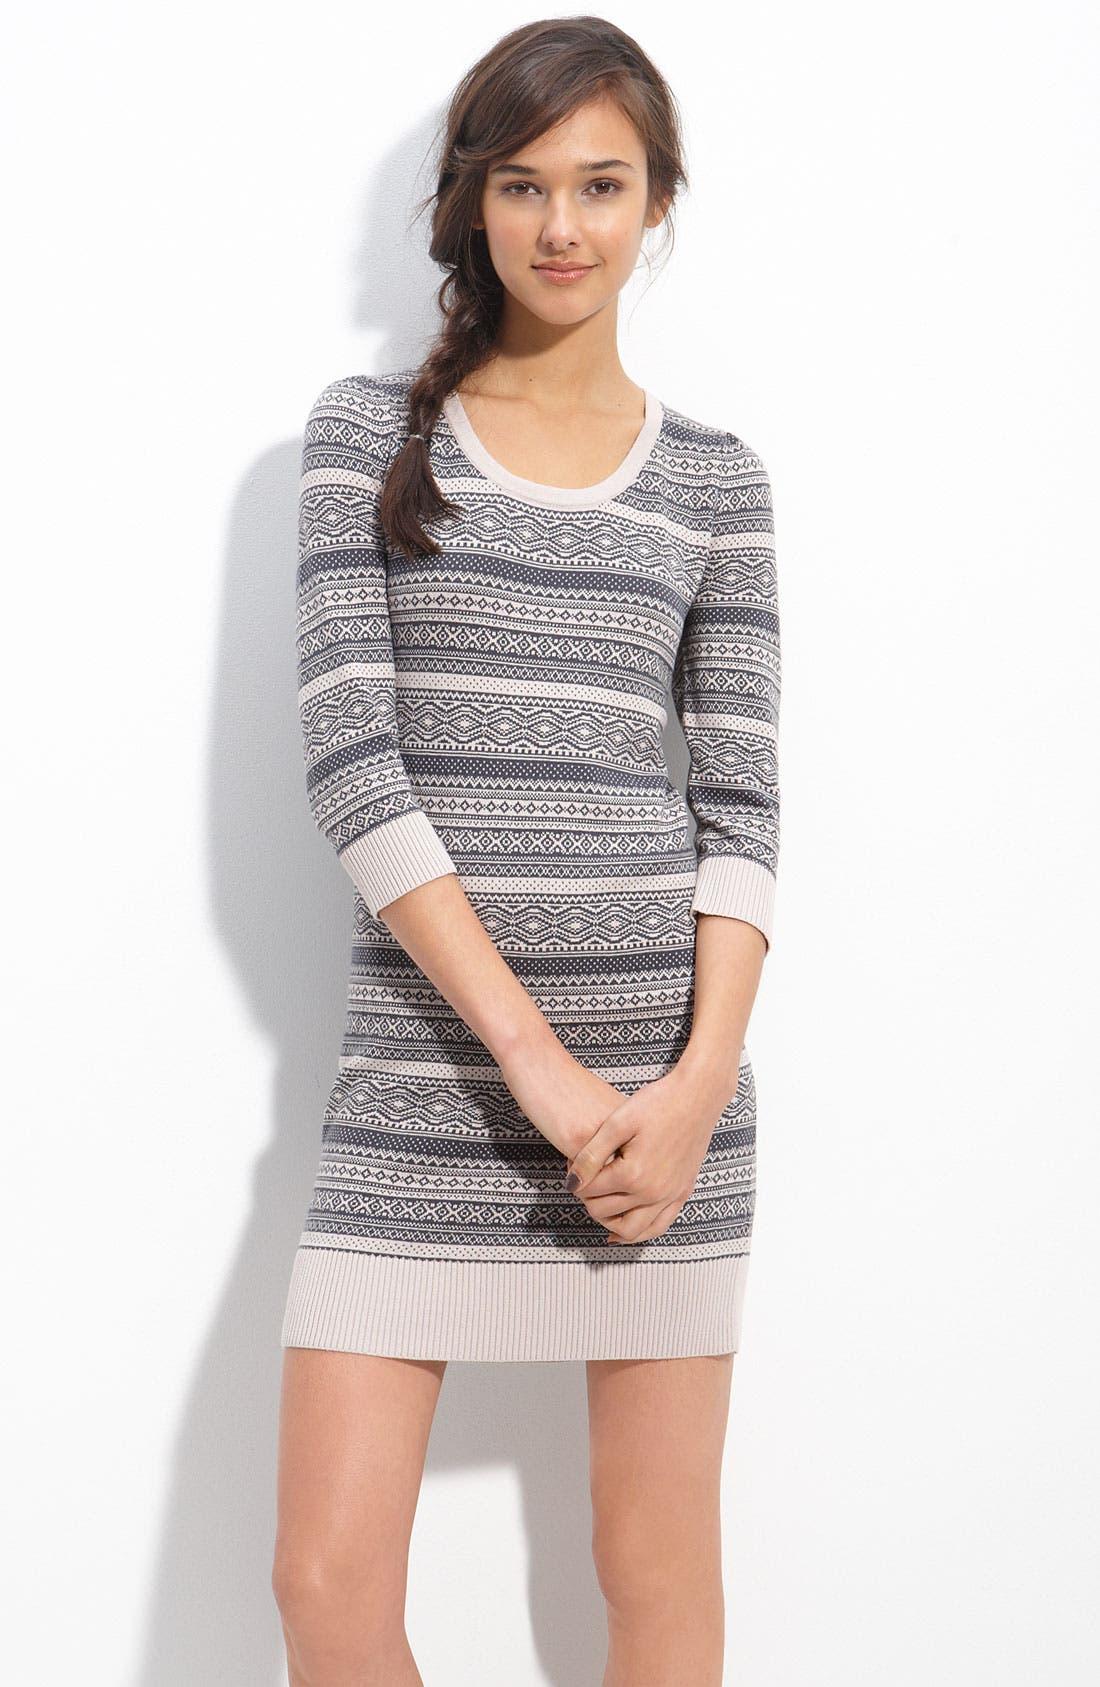 Alternate Image 1 Selected - Frenchi® Ribbed Trim Sweater Dress (Juniors)